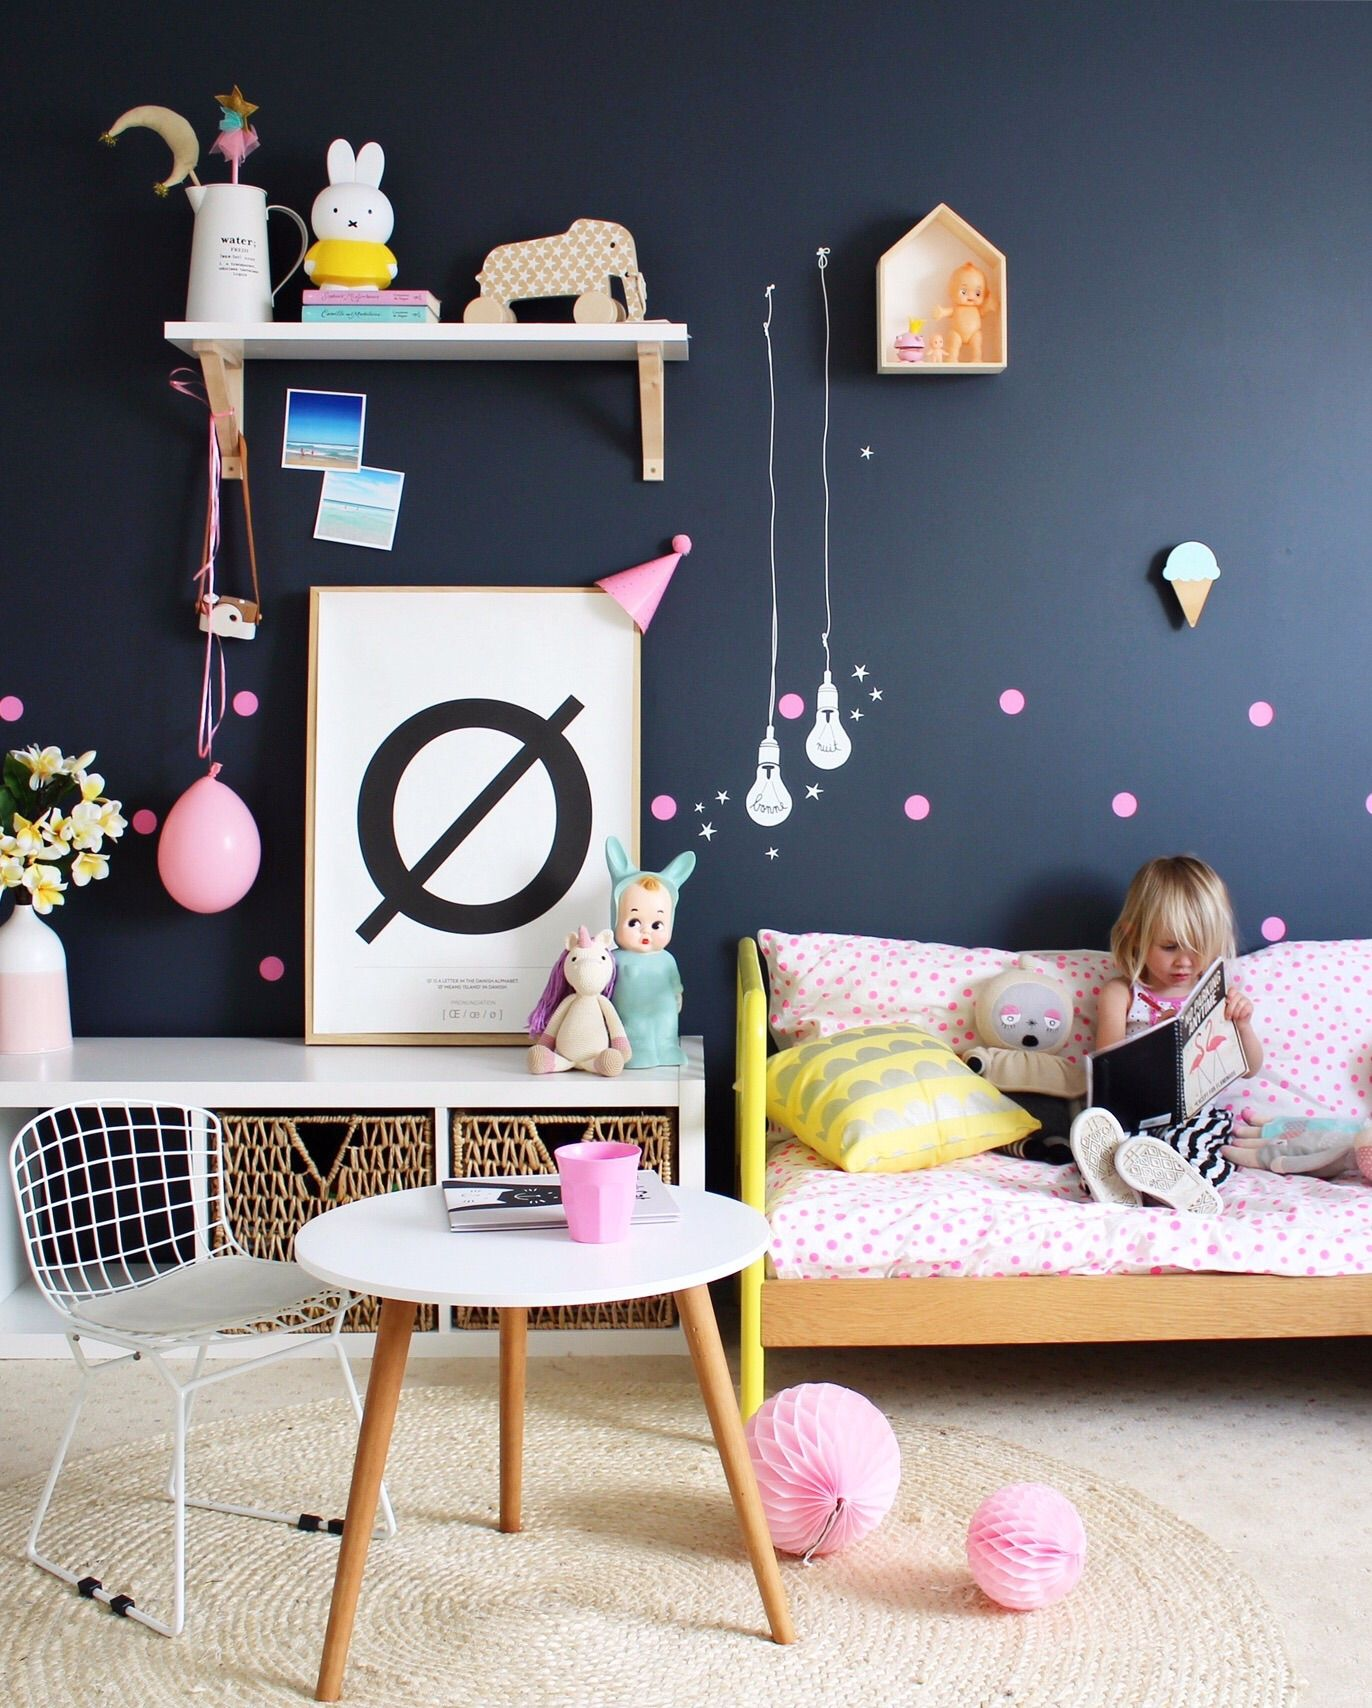 Kidsu0027 Bedroom Ideas   Celebrating The 10th Anniversary Of French Designer  MIMIu0027lou!